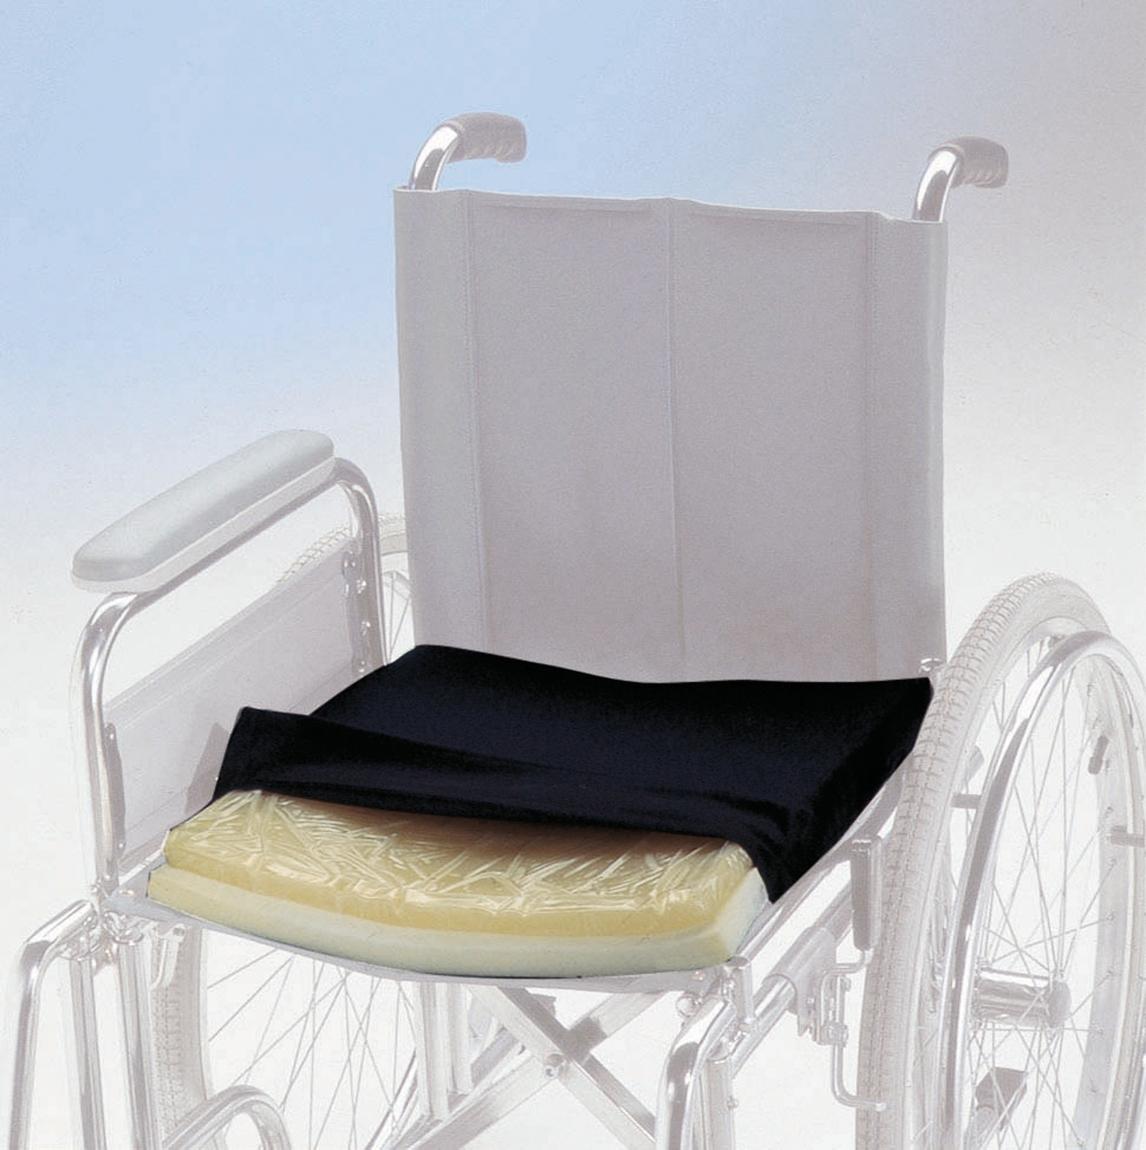 Cuscino Antidecubito in Gel Fluido per sedia a rotelle